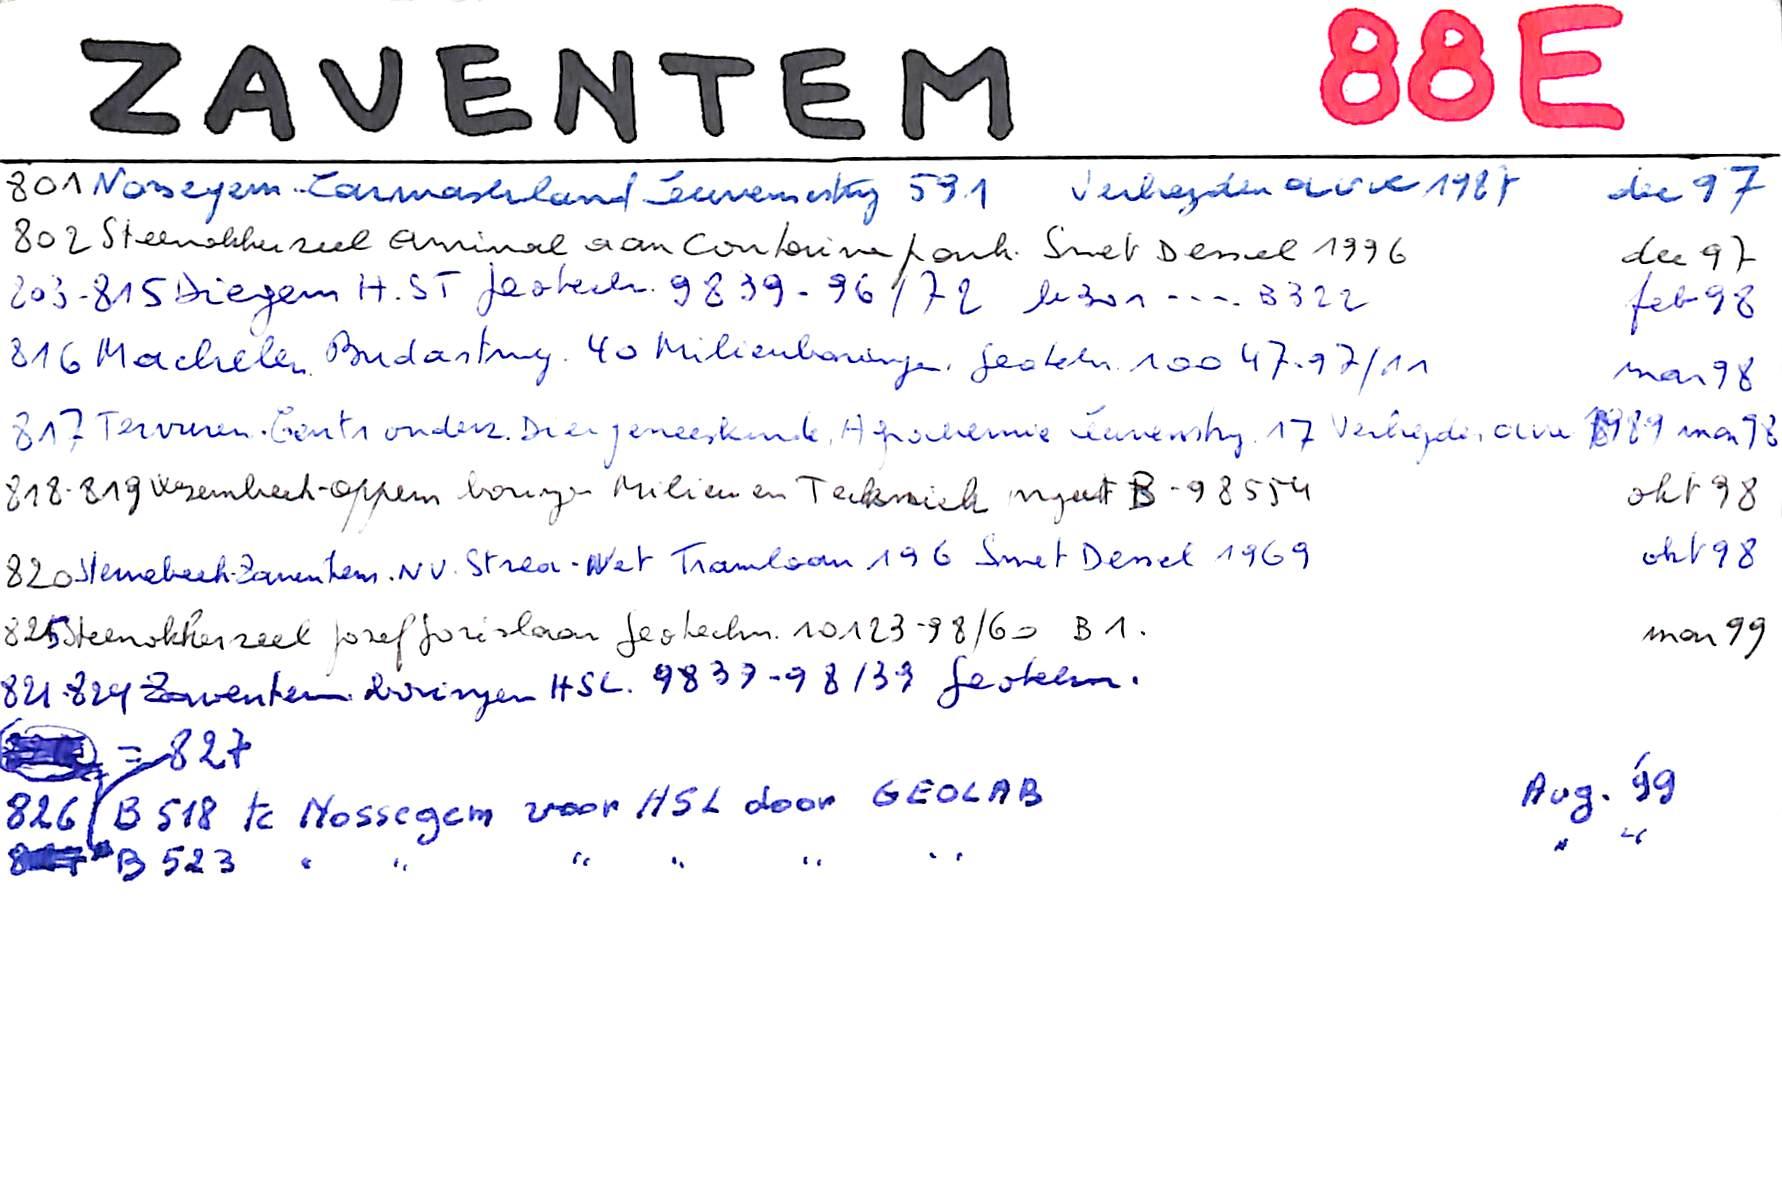 88E 801-827.jpg